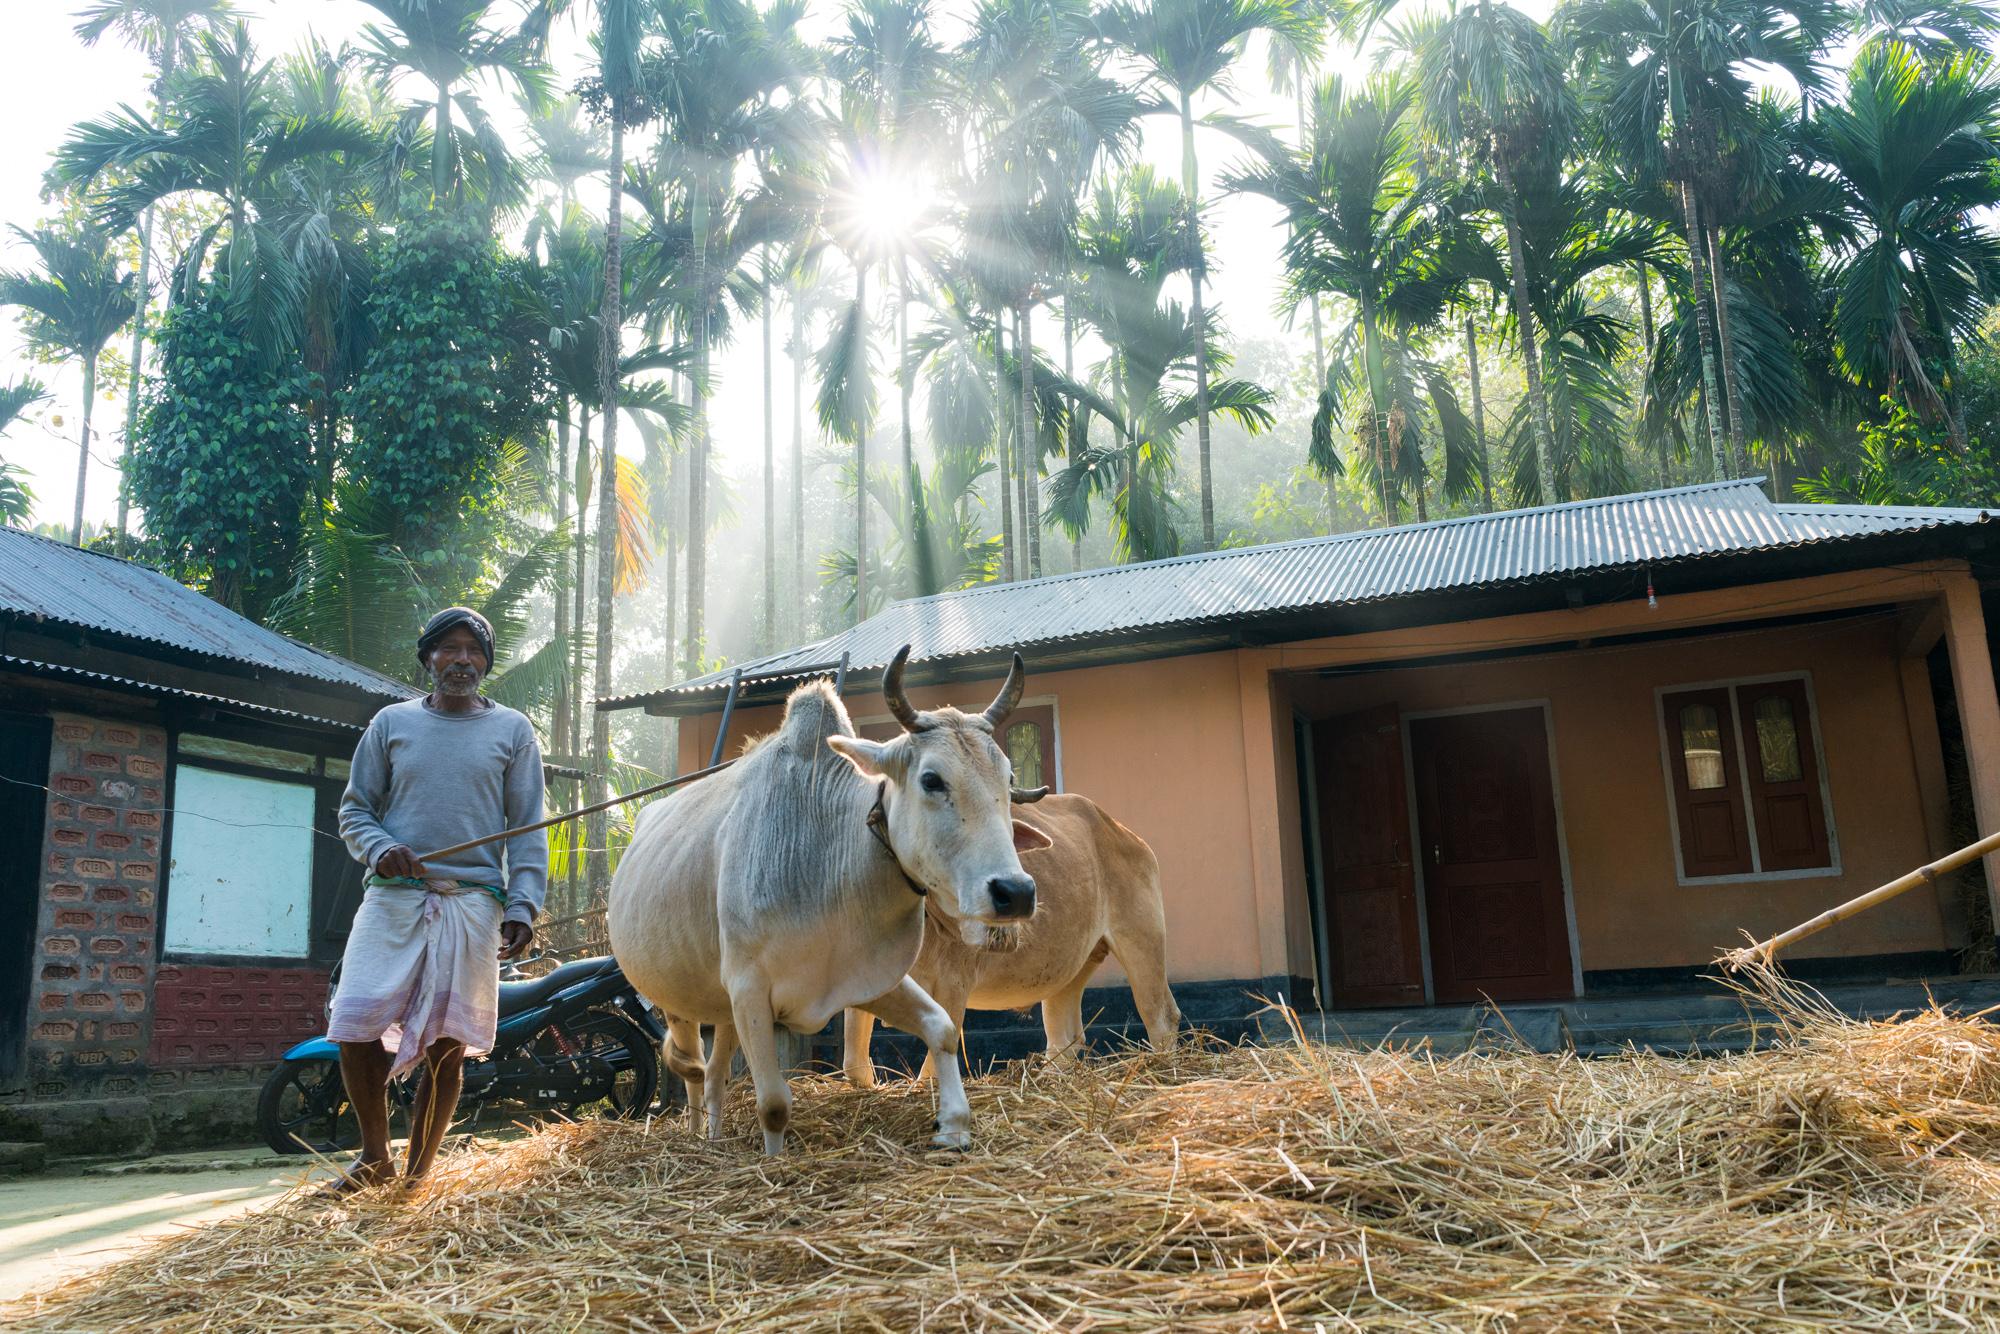 Daily life in an Assamese village